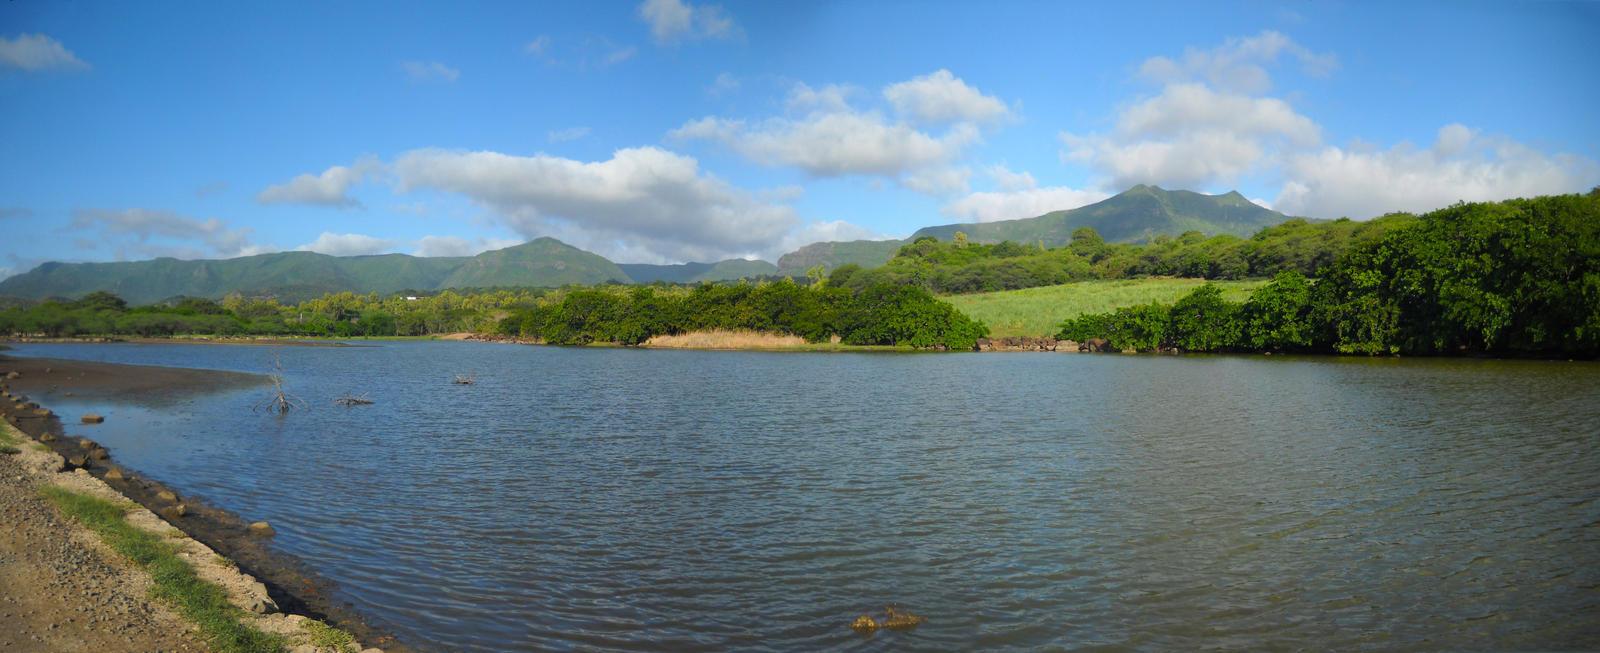 Black River Range Panorama by carrotmadman6